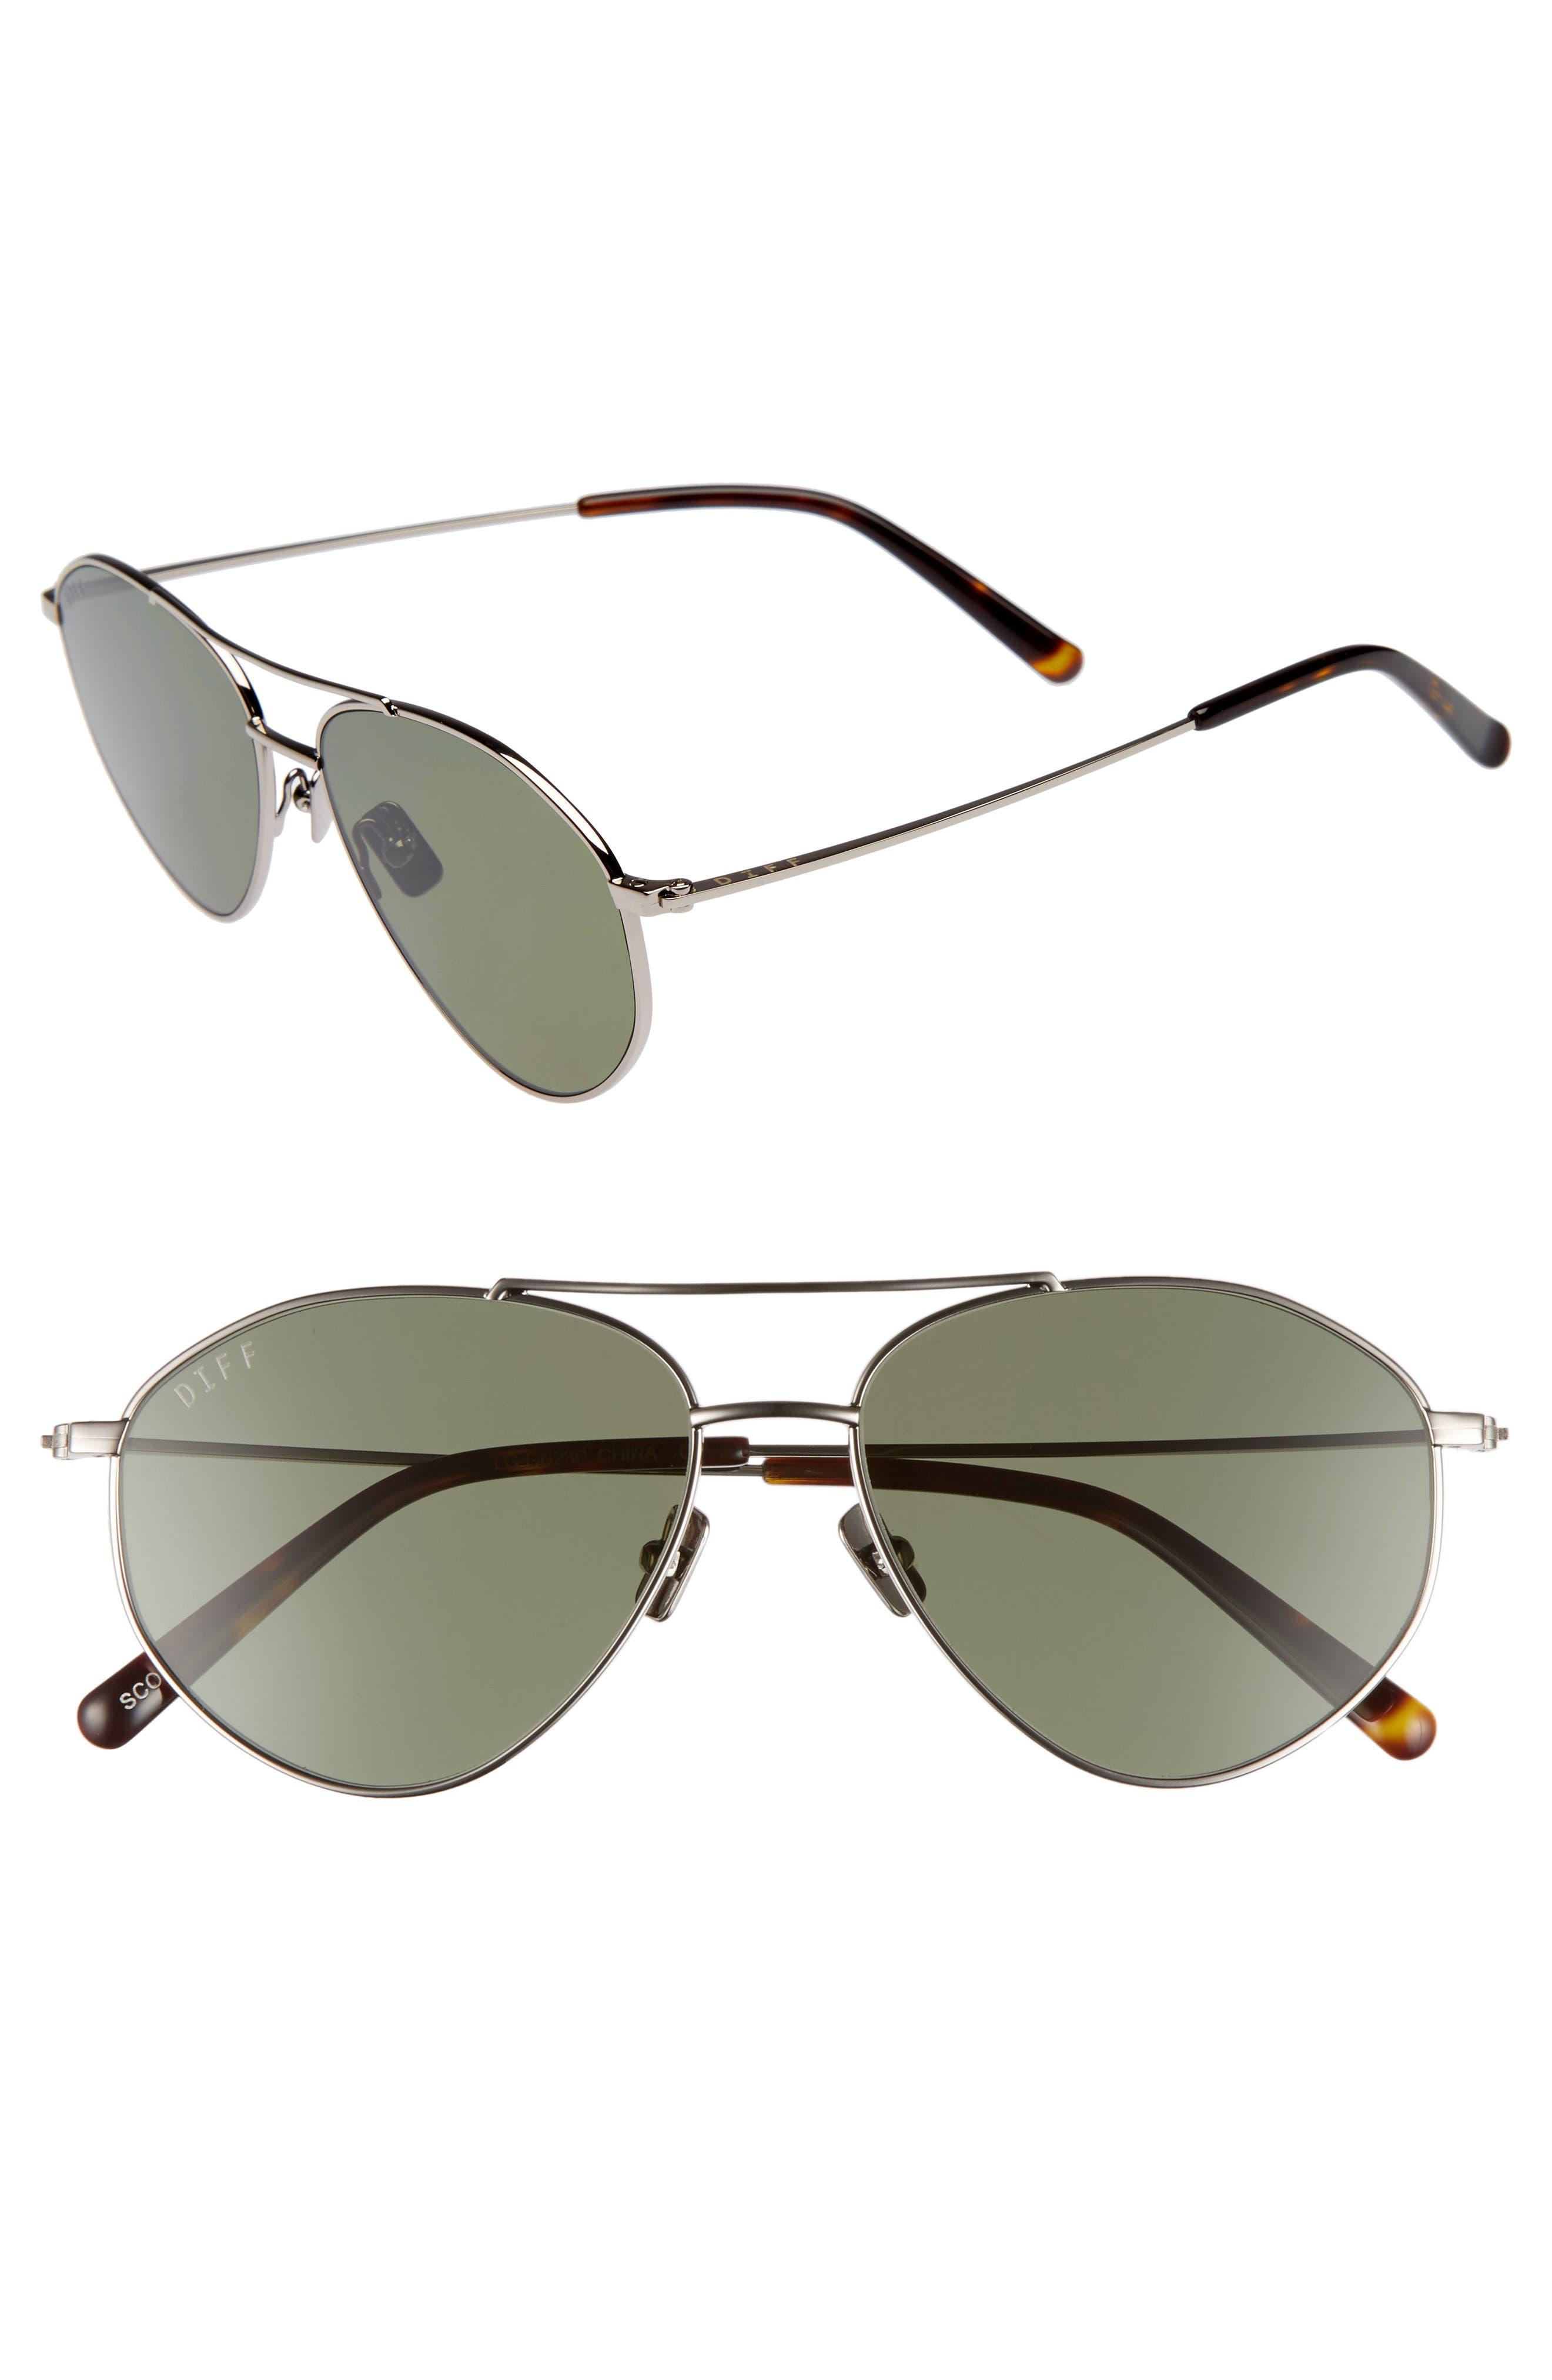 Scout 53mm Aviator Sunglasses,                             Main thumbnail 1, color,                             020